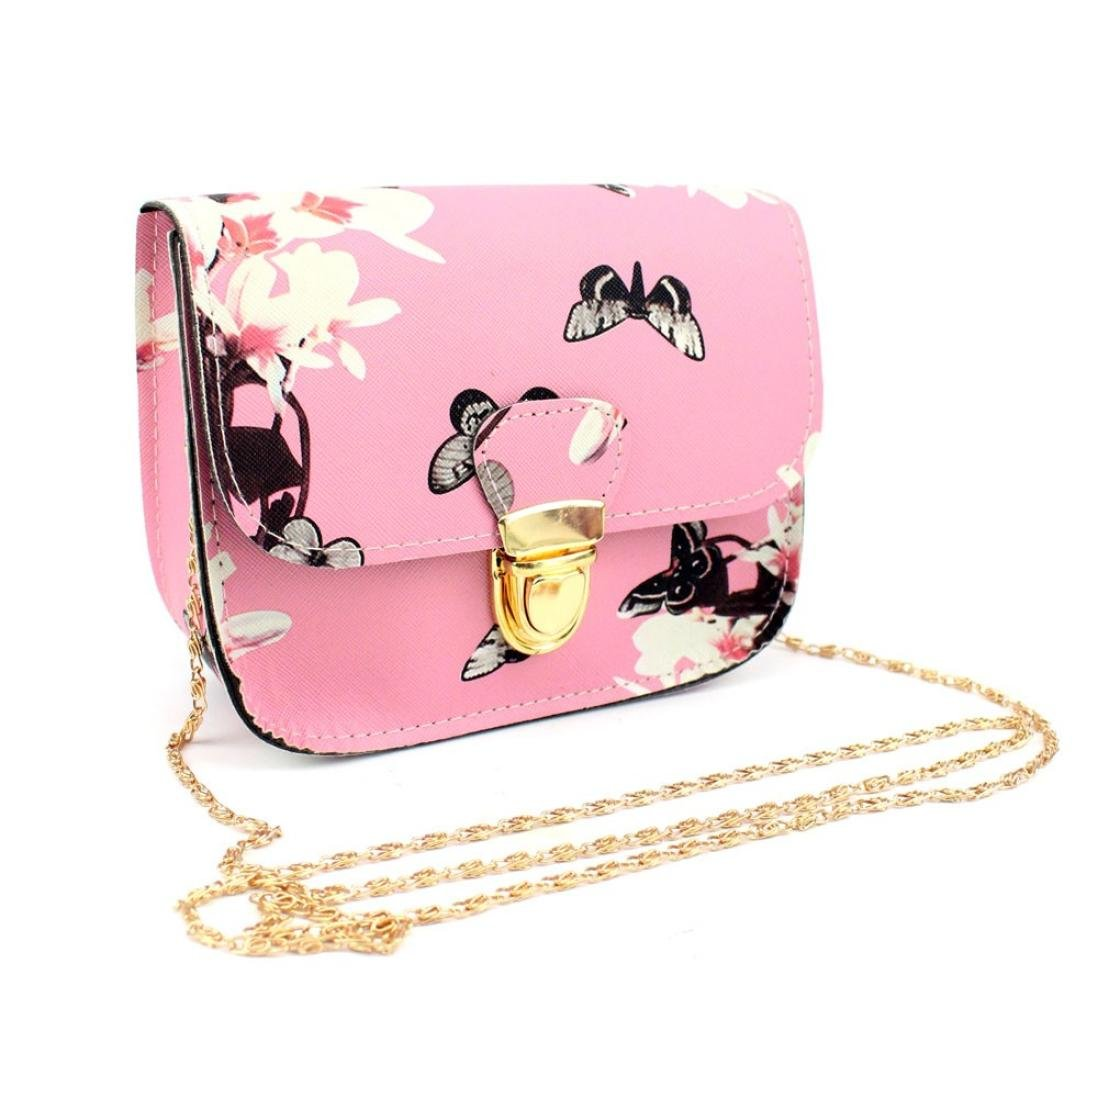 Women Love Bags, Ladies Classical Butterfly Flower Handbag Tote Messenger Elegent Shoulder Bag Ladies Classical Butterfly Flower Handbag Tote Messenger Elegent Shoulder Bag (Black) pocciol KIBO19960309